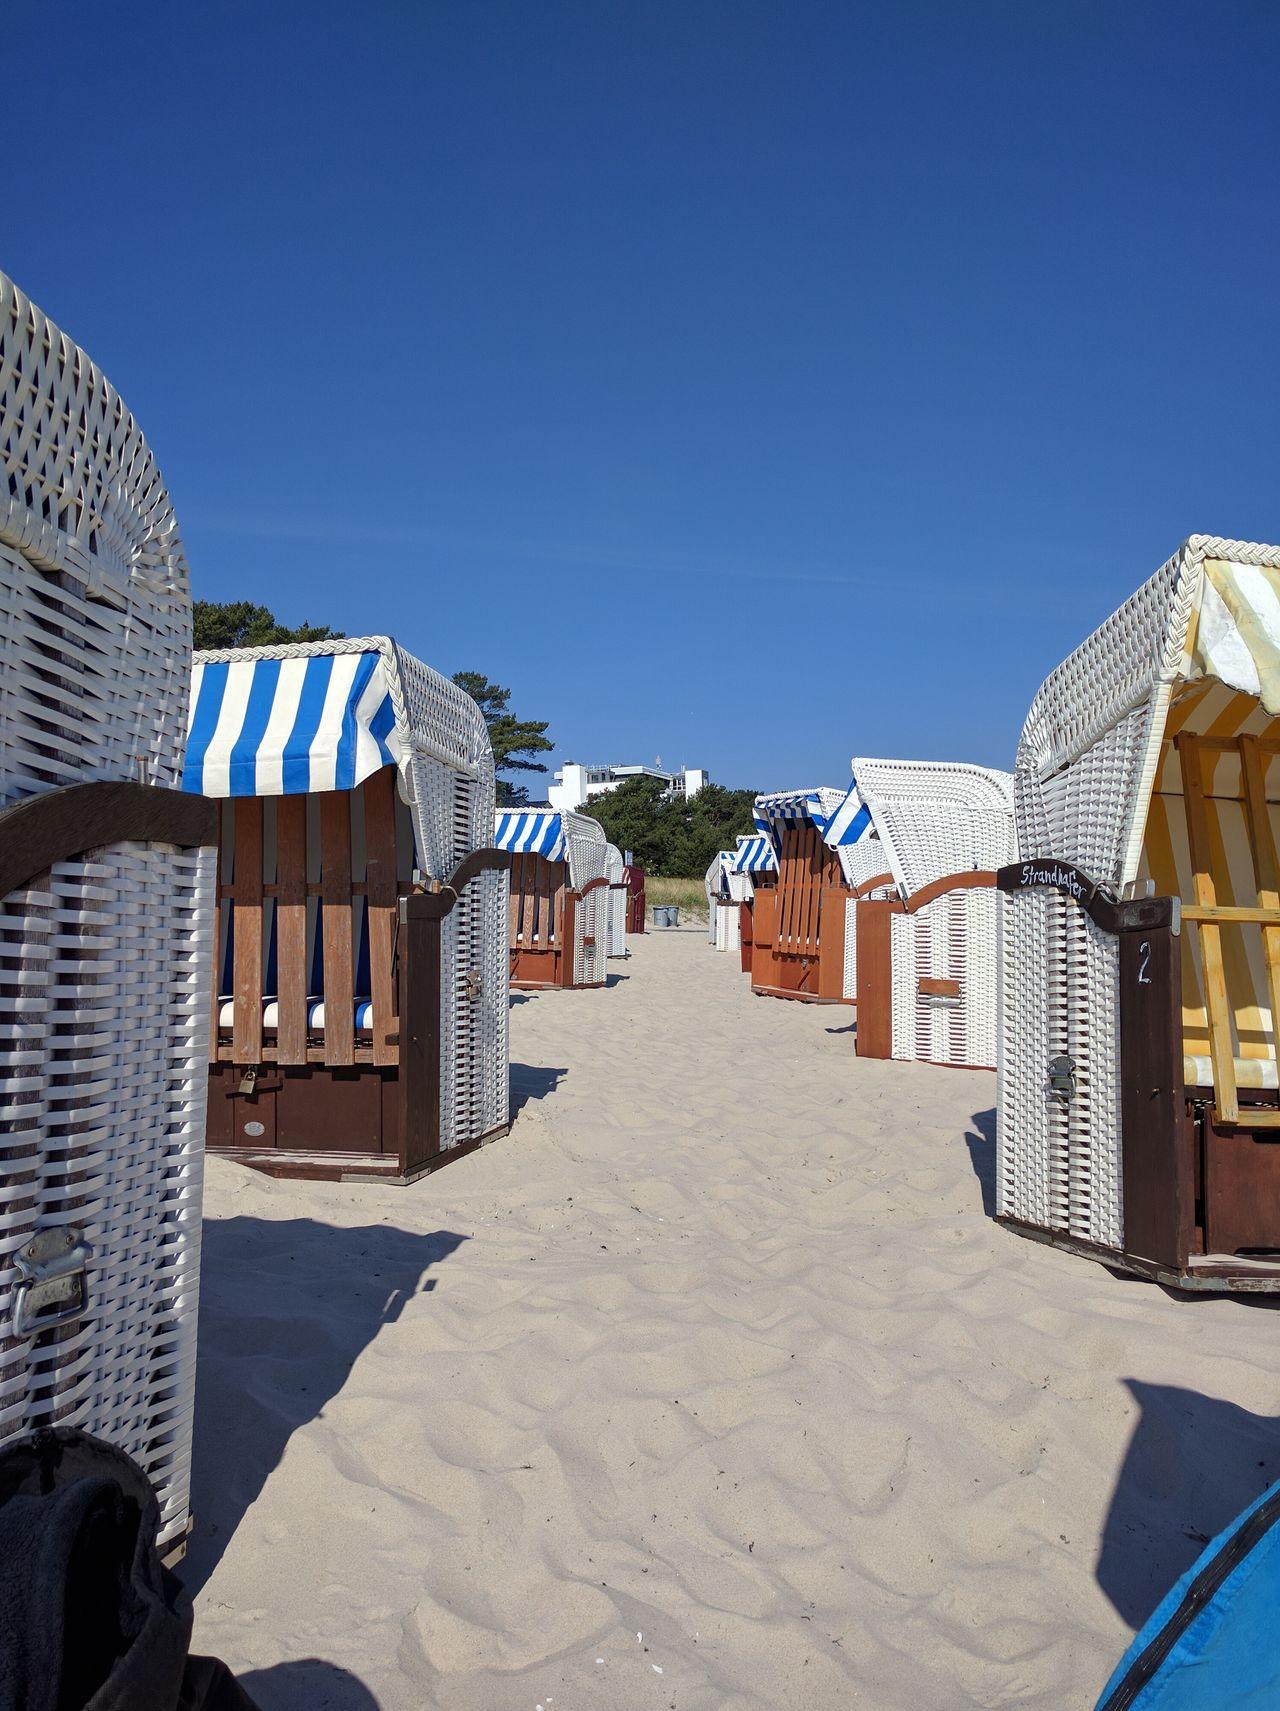 Baltic Sea Beach Photography Blue Sky Ostseebad Binz Ostseestrand Outdoors Sky Strandkorb Sunny